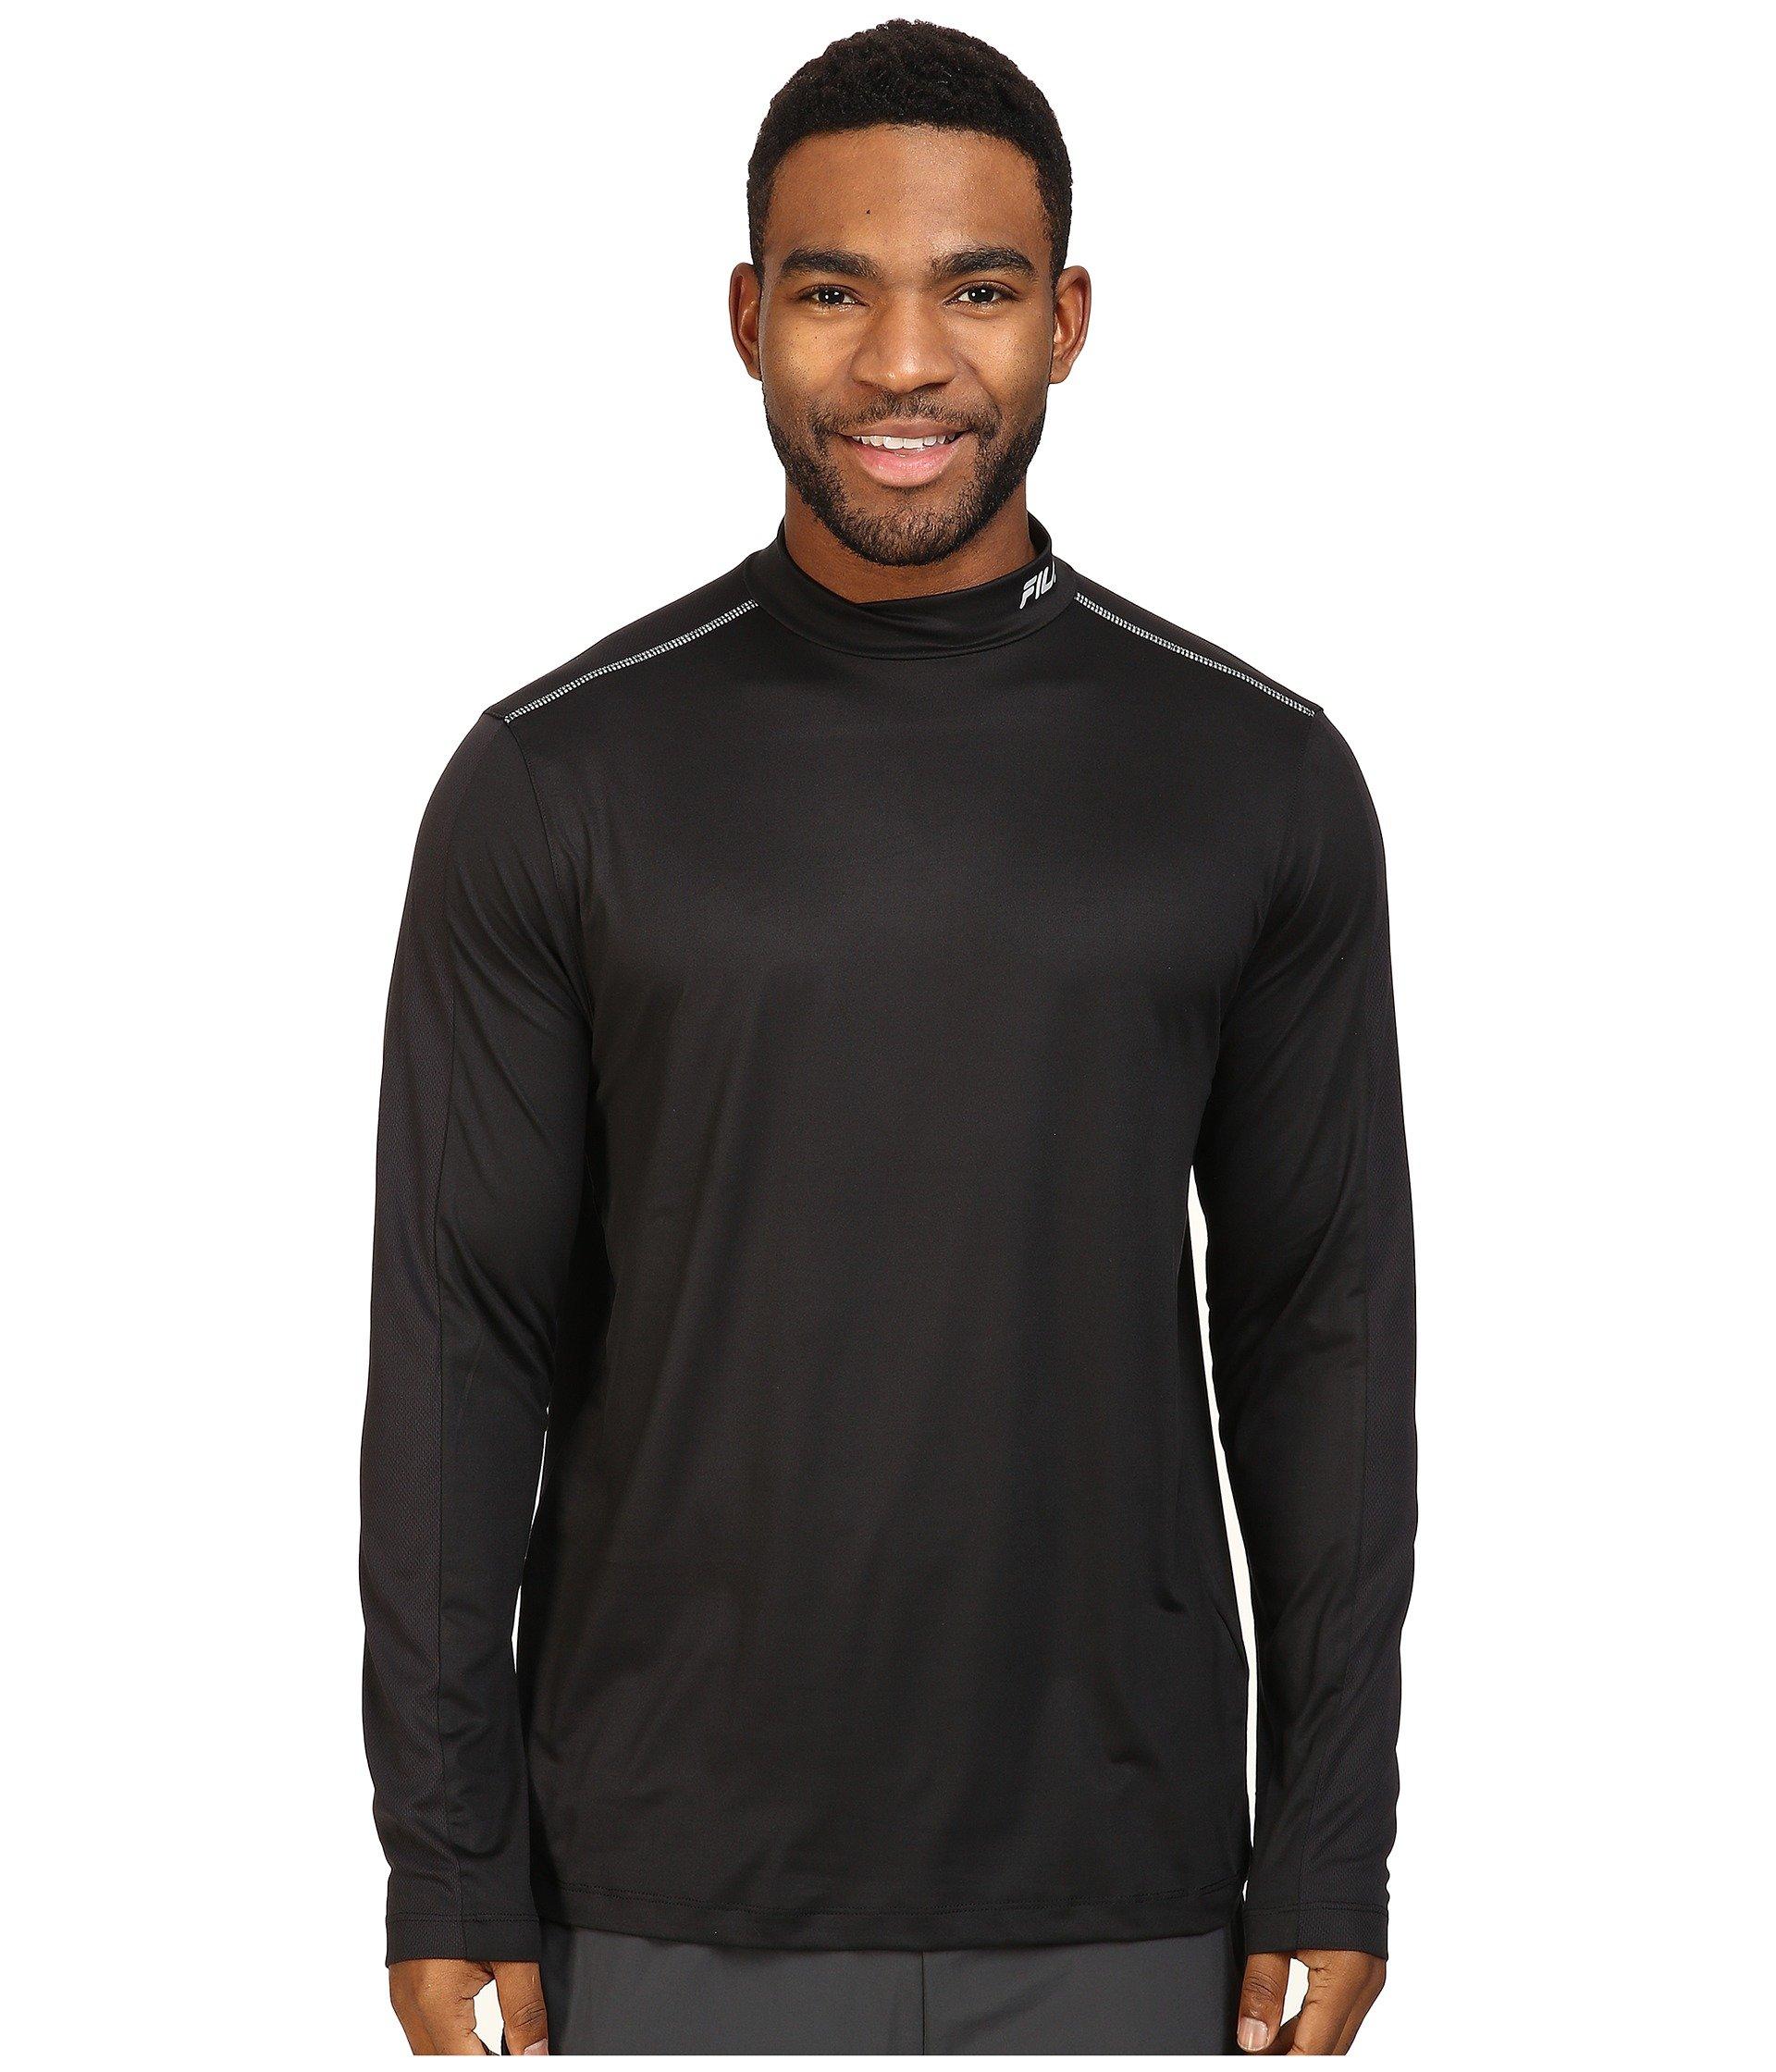 Camiseta para Hombre Fila Base Layer Long Sleeve Top  + Fila en VeoyCompro.net